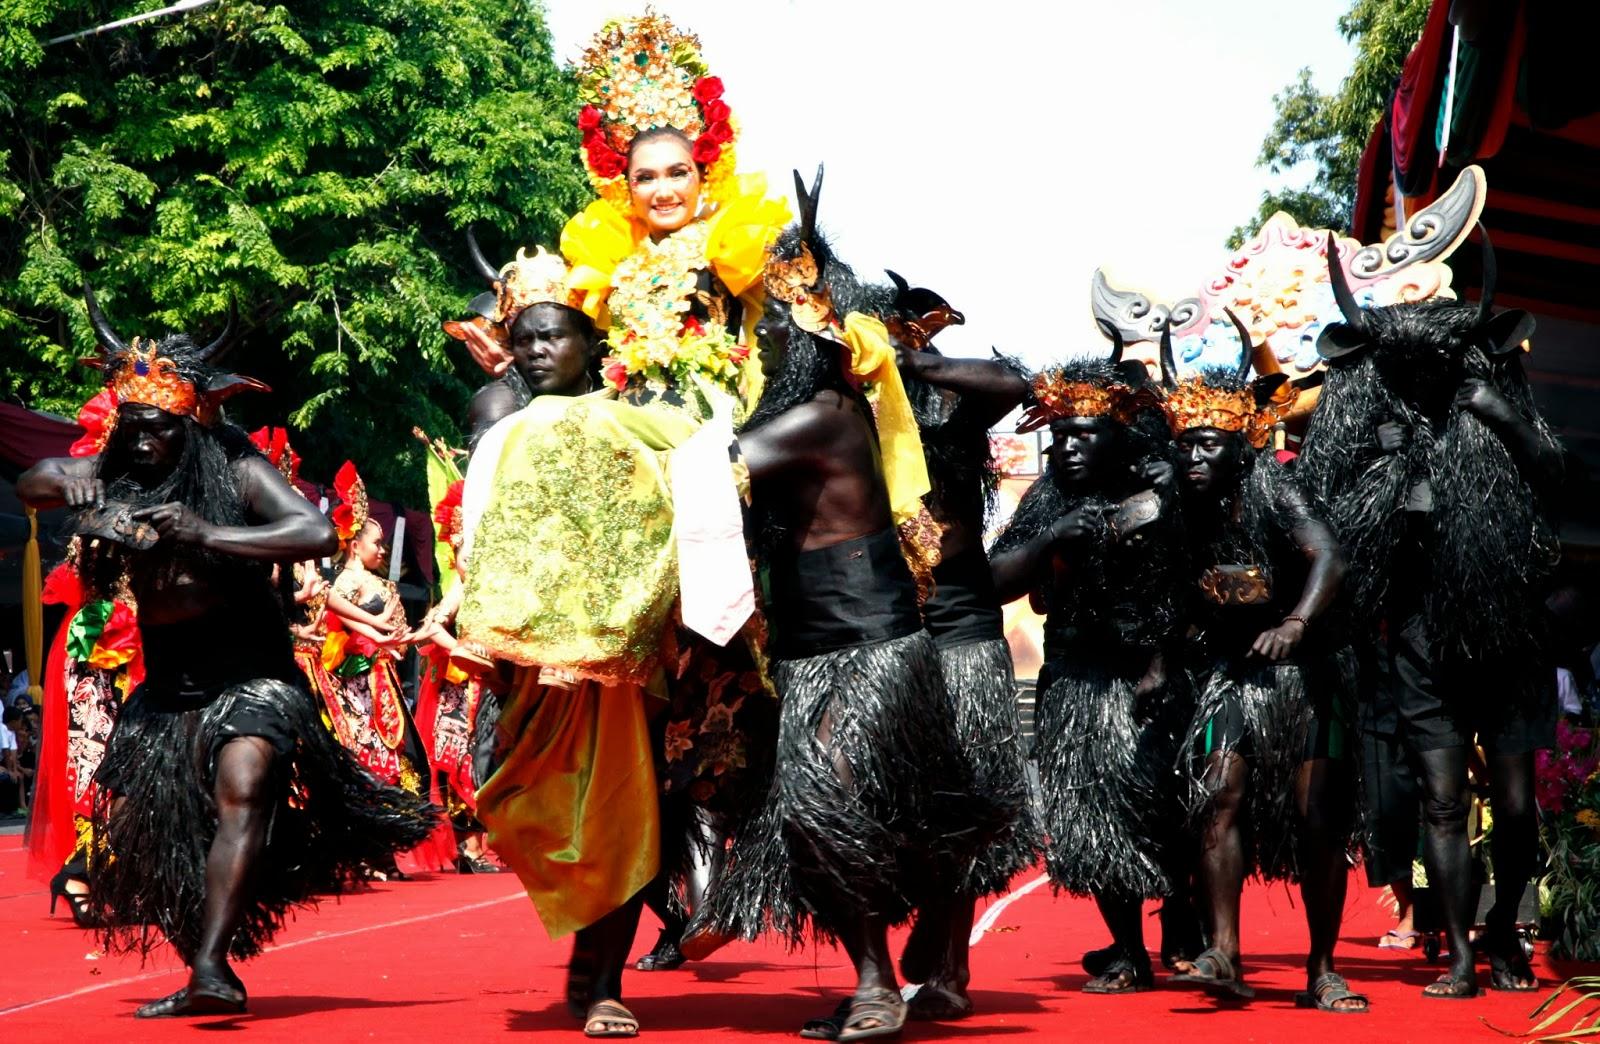 Festival Keboan Banyuwangi | Sumber: Majalah Gempur